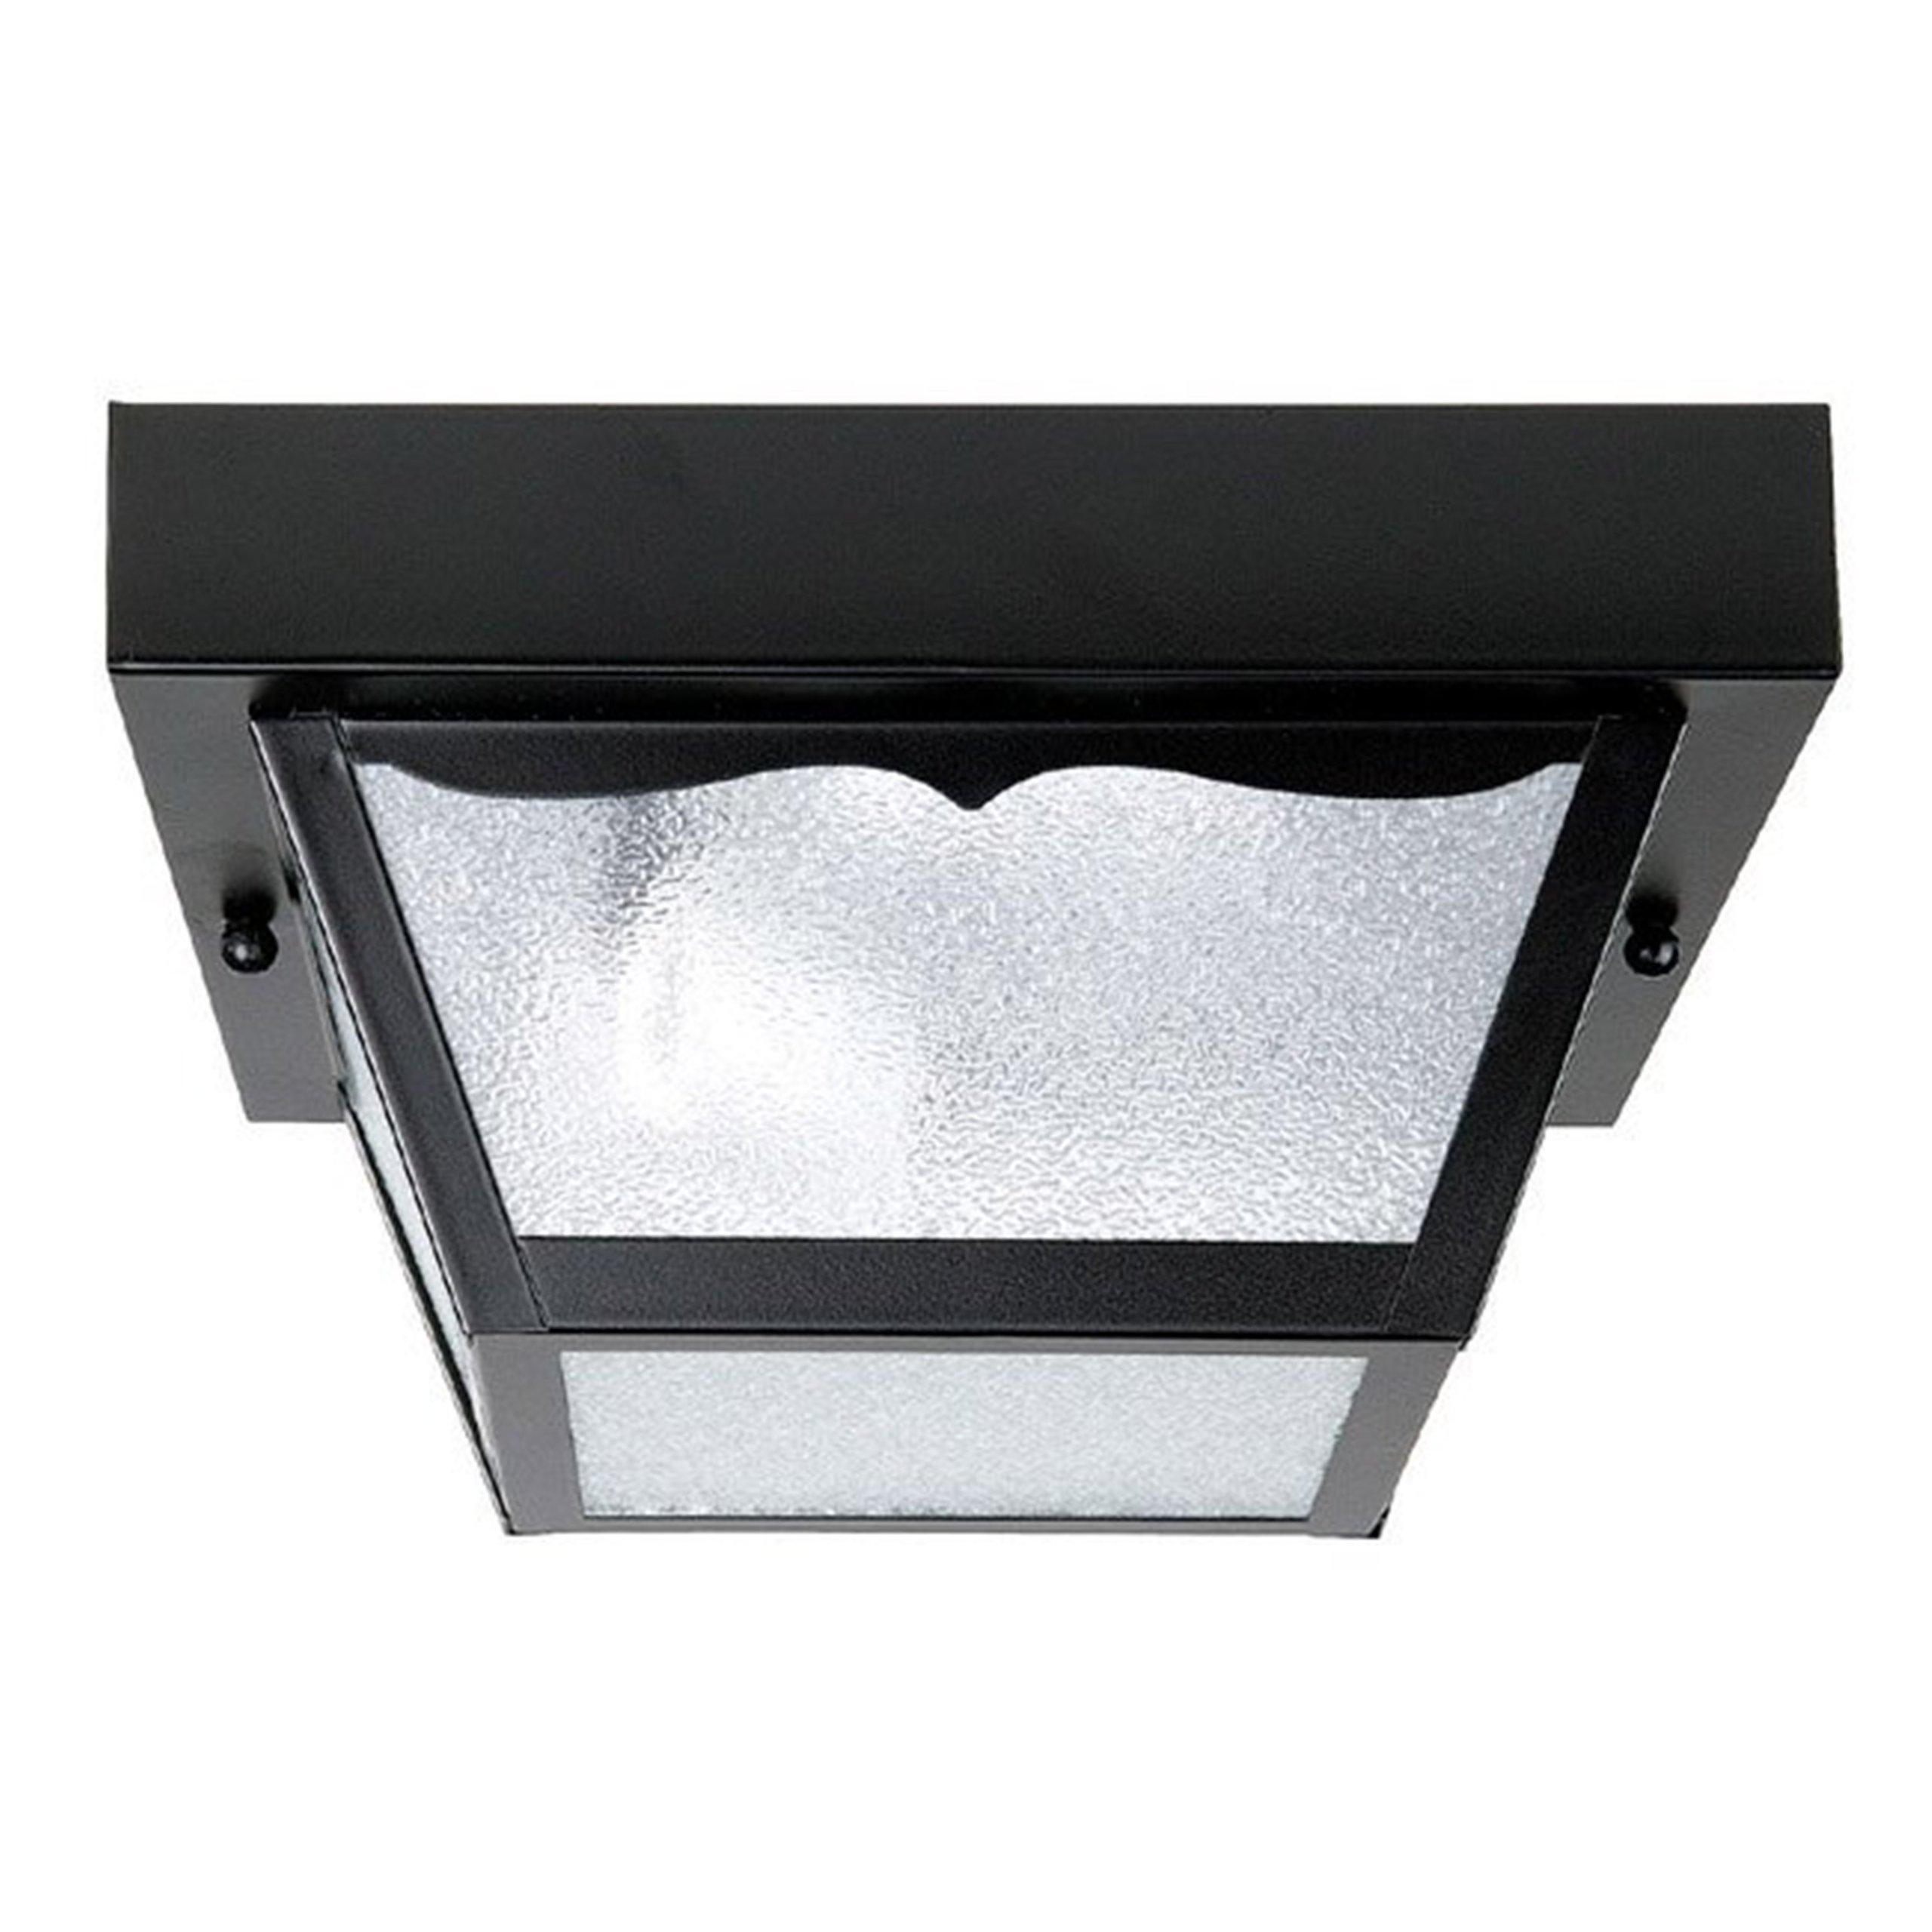 Capital Lighting 9937BK 1-Light Carport Steel Exterior Flush Mount, Black Finish